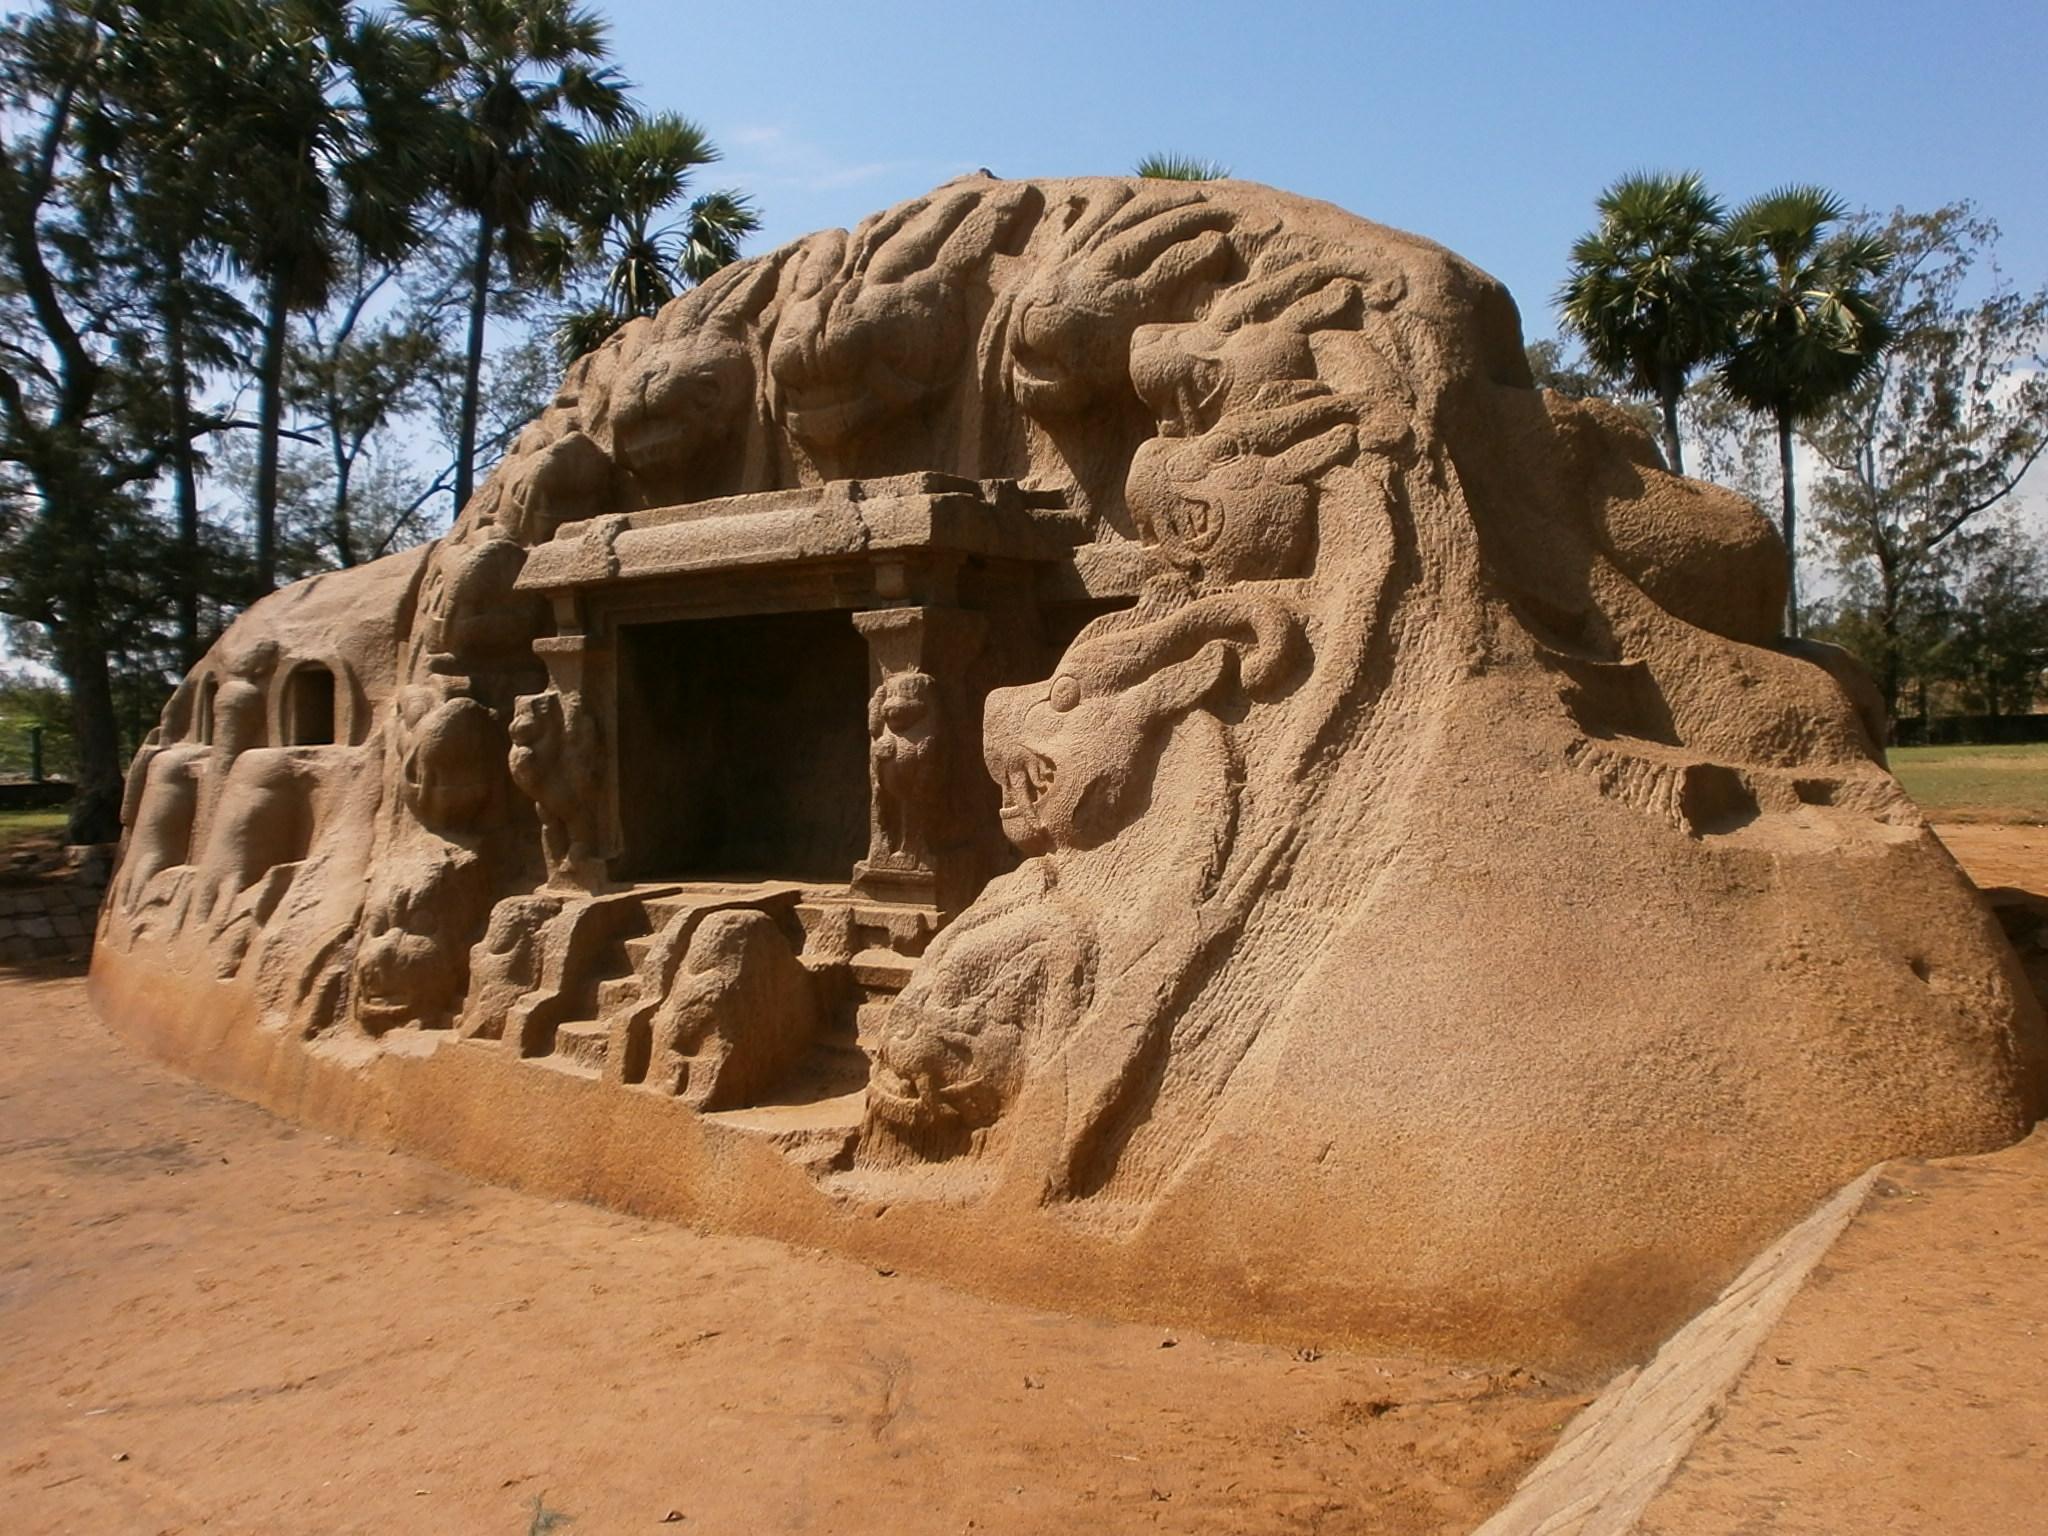 Tiger's Cave (Yali Mandapam)